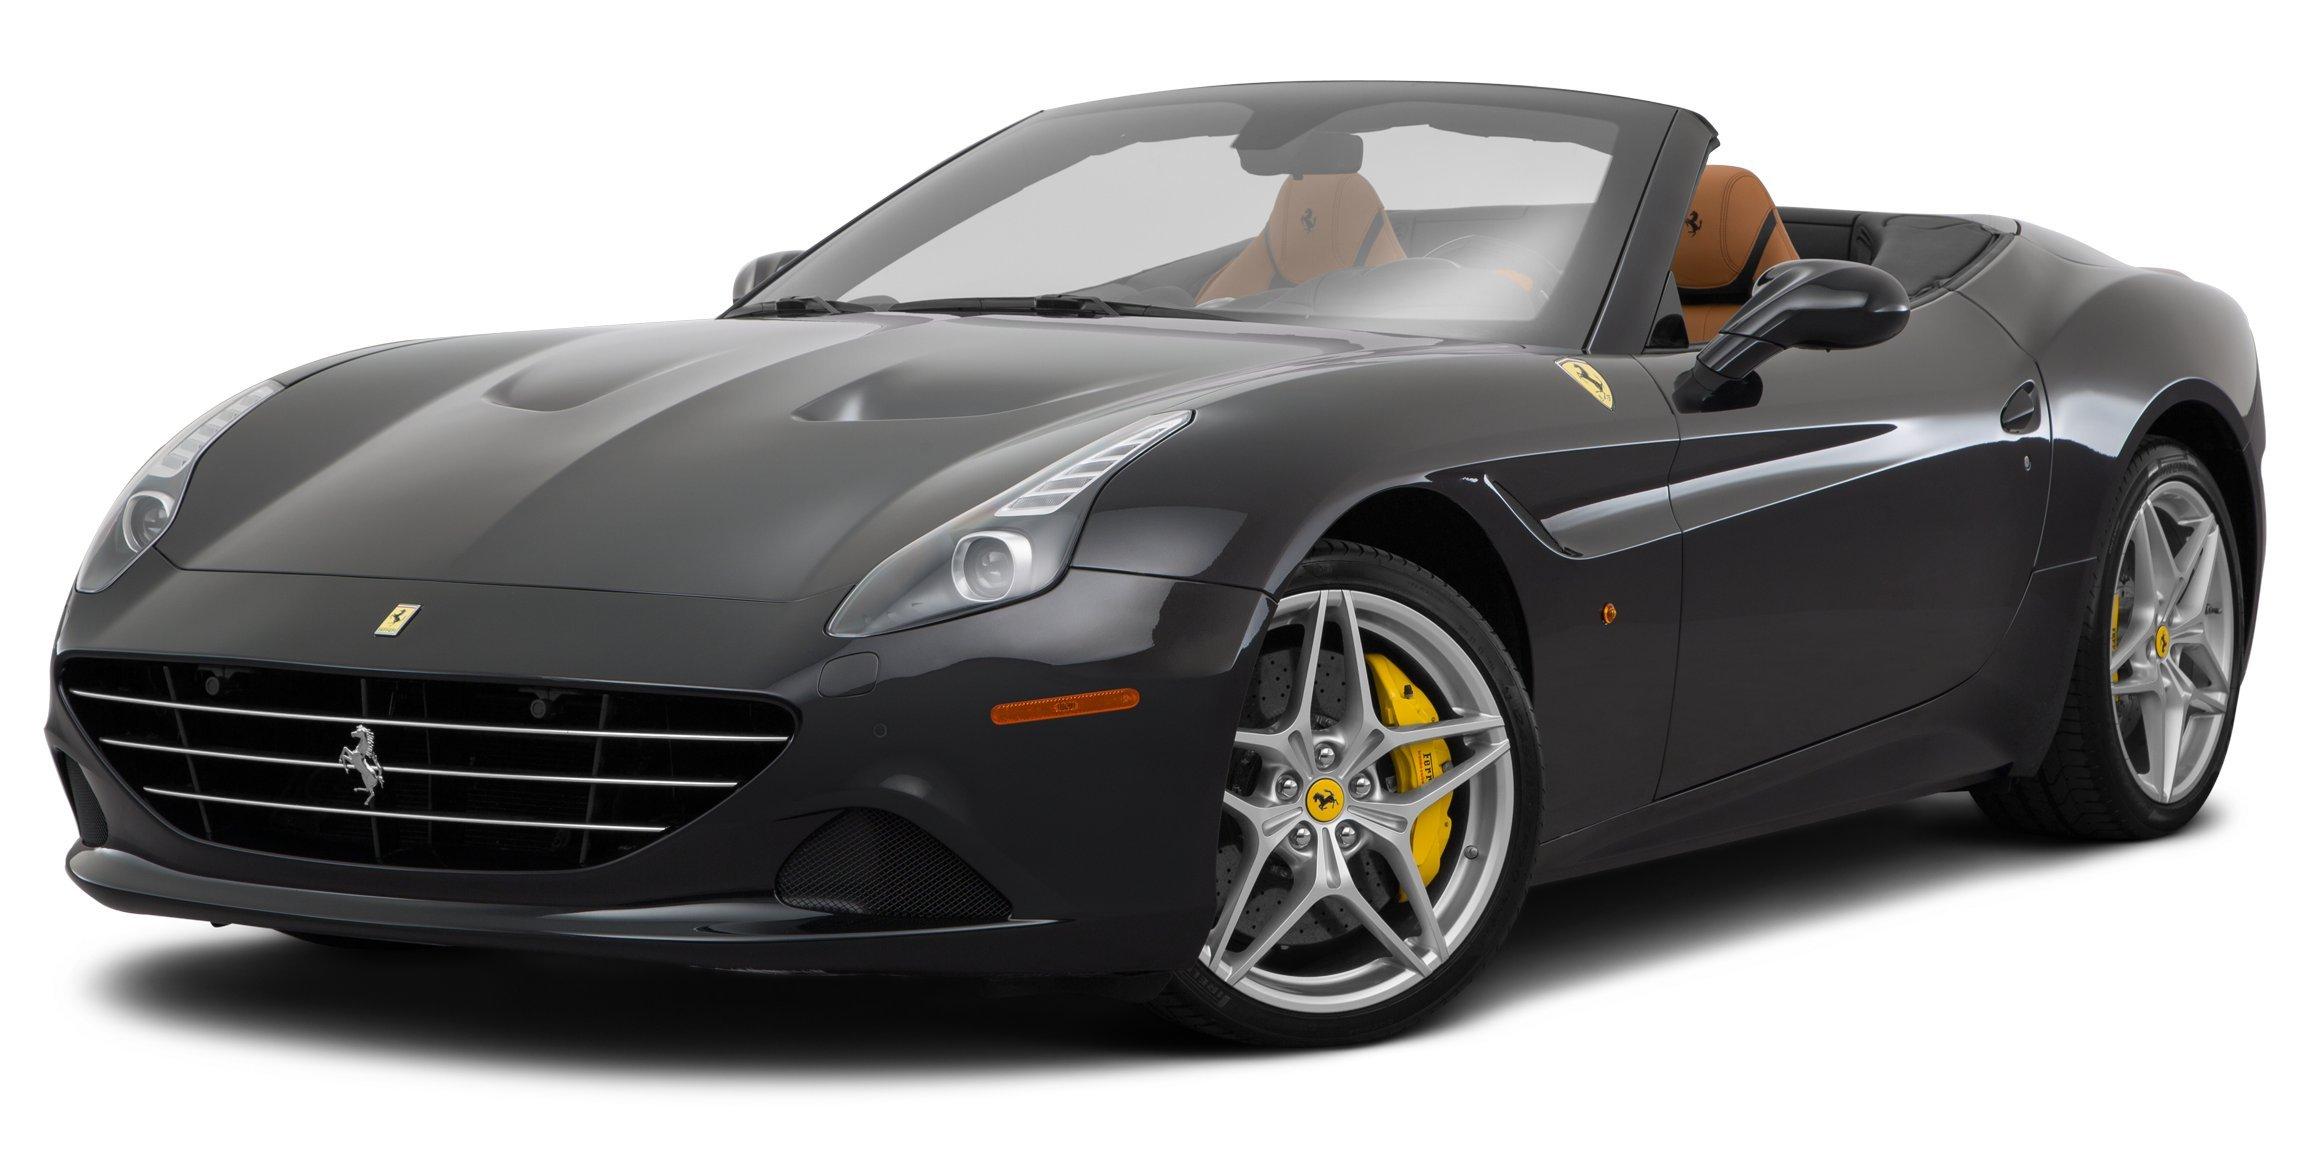 Amazon 2015 Aston Martin DB9 Reviews and Specs Vehicles